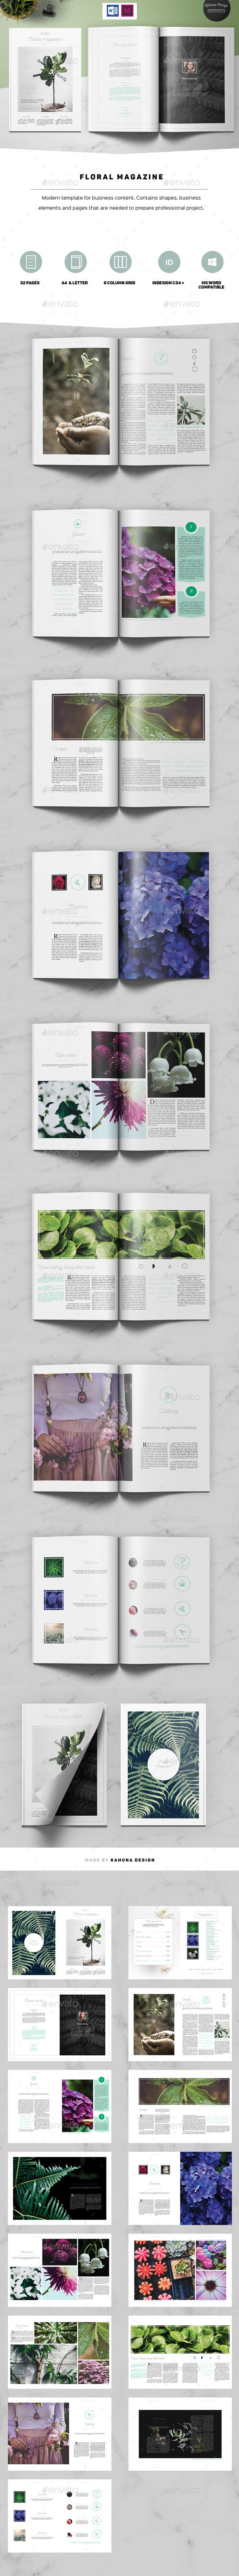 Floral Magazine - Magazines Print Templates